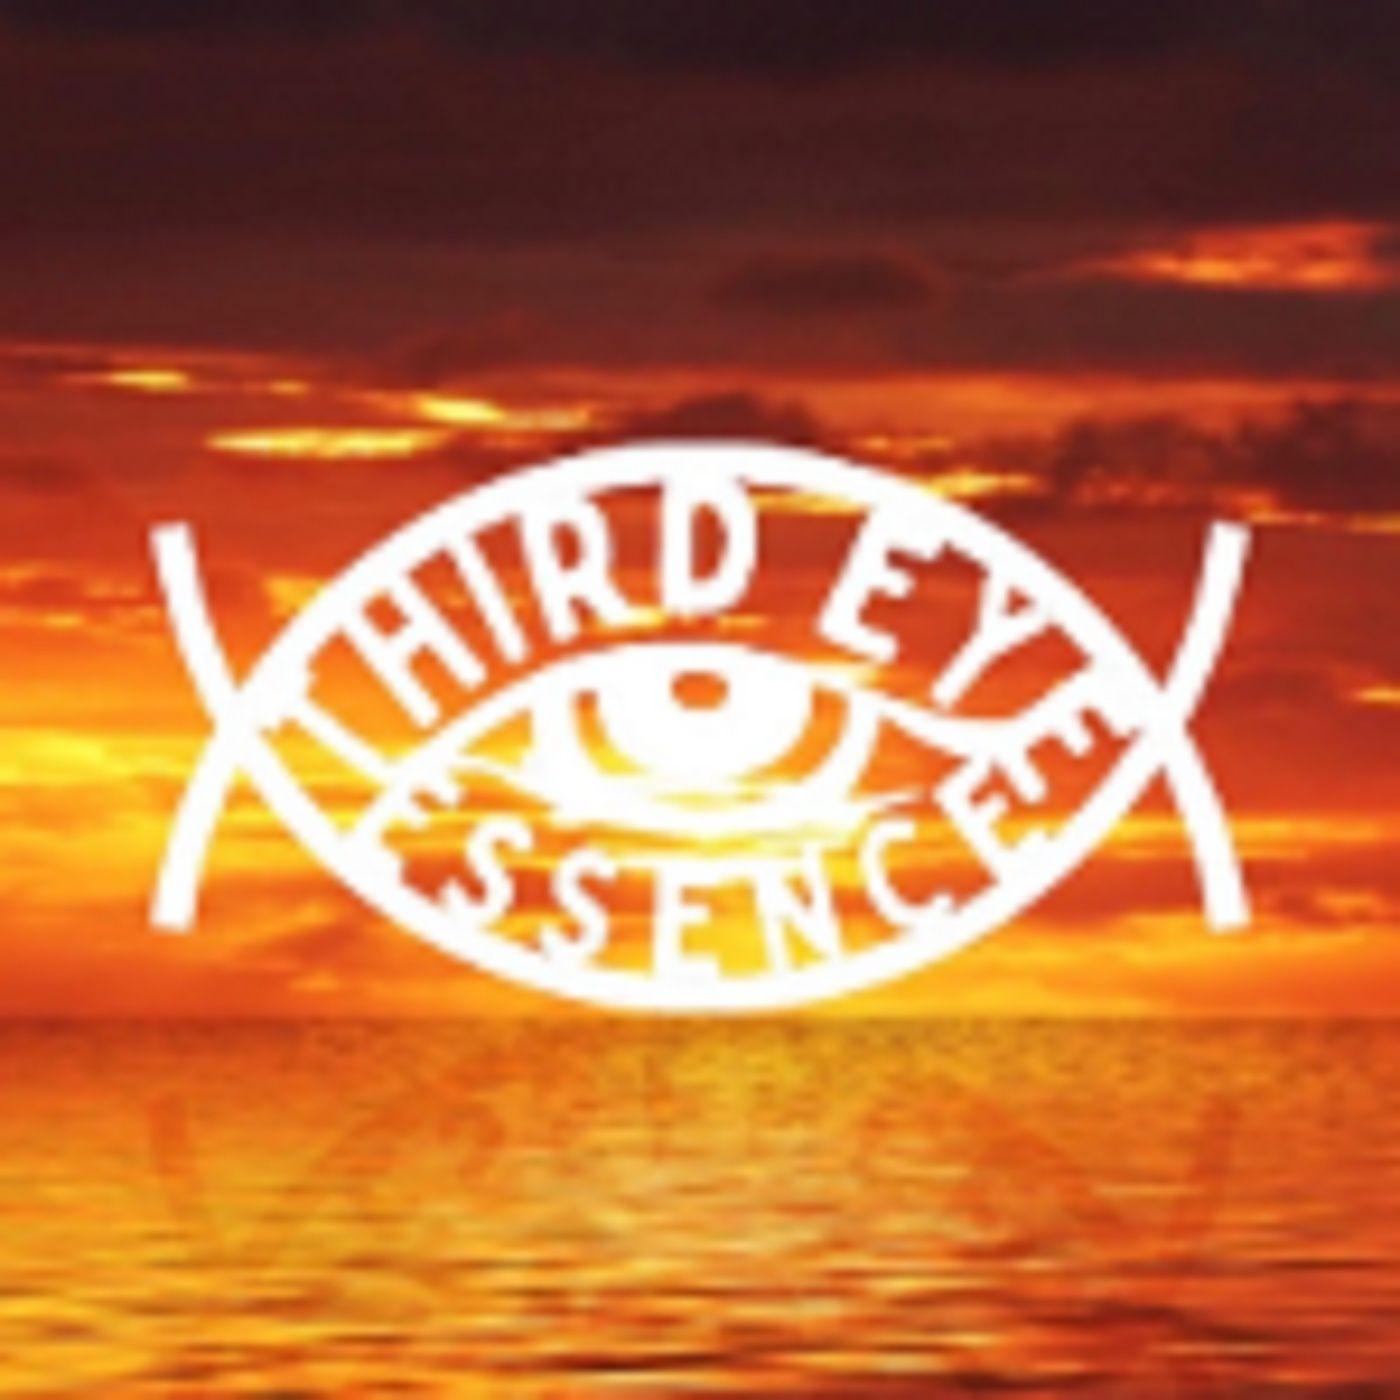 Spiritual Awakening, the UFO Phenomena, Ghosts & More with Mike Seniff